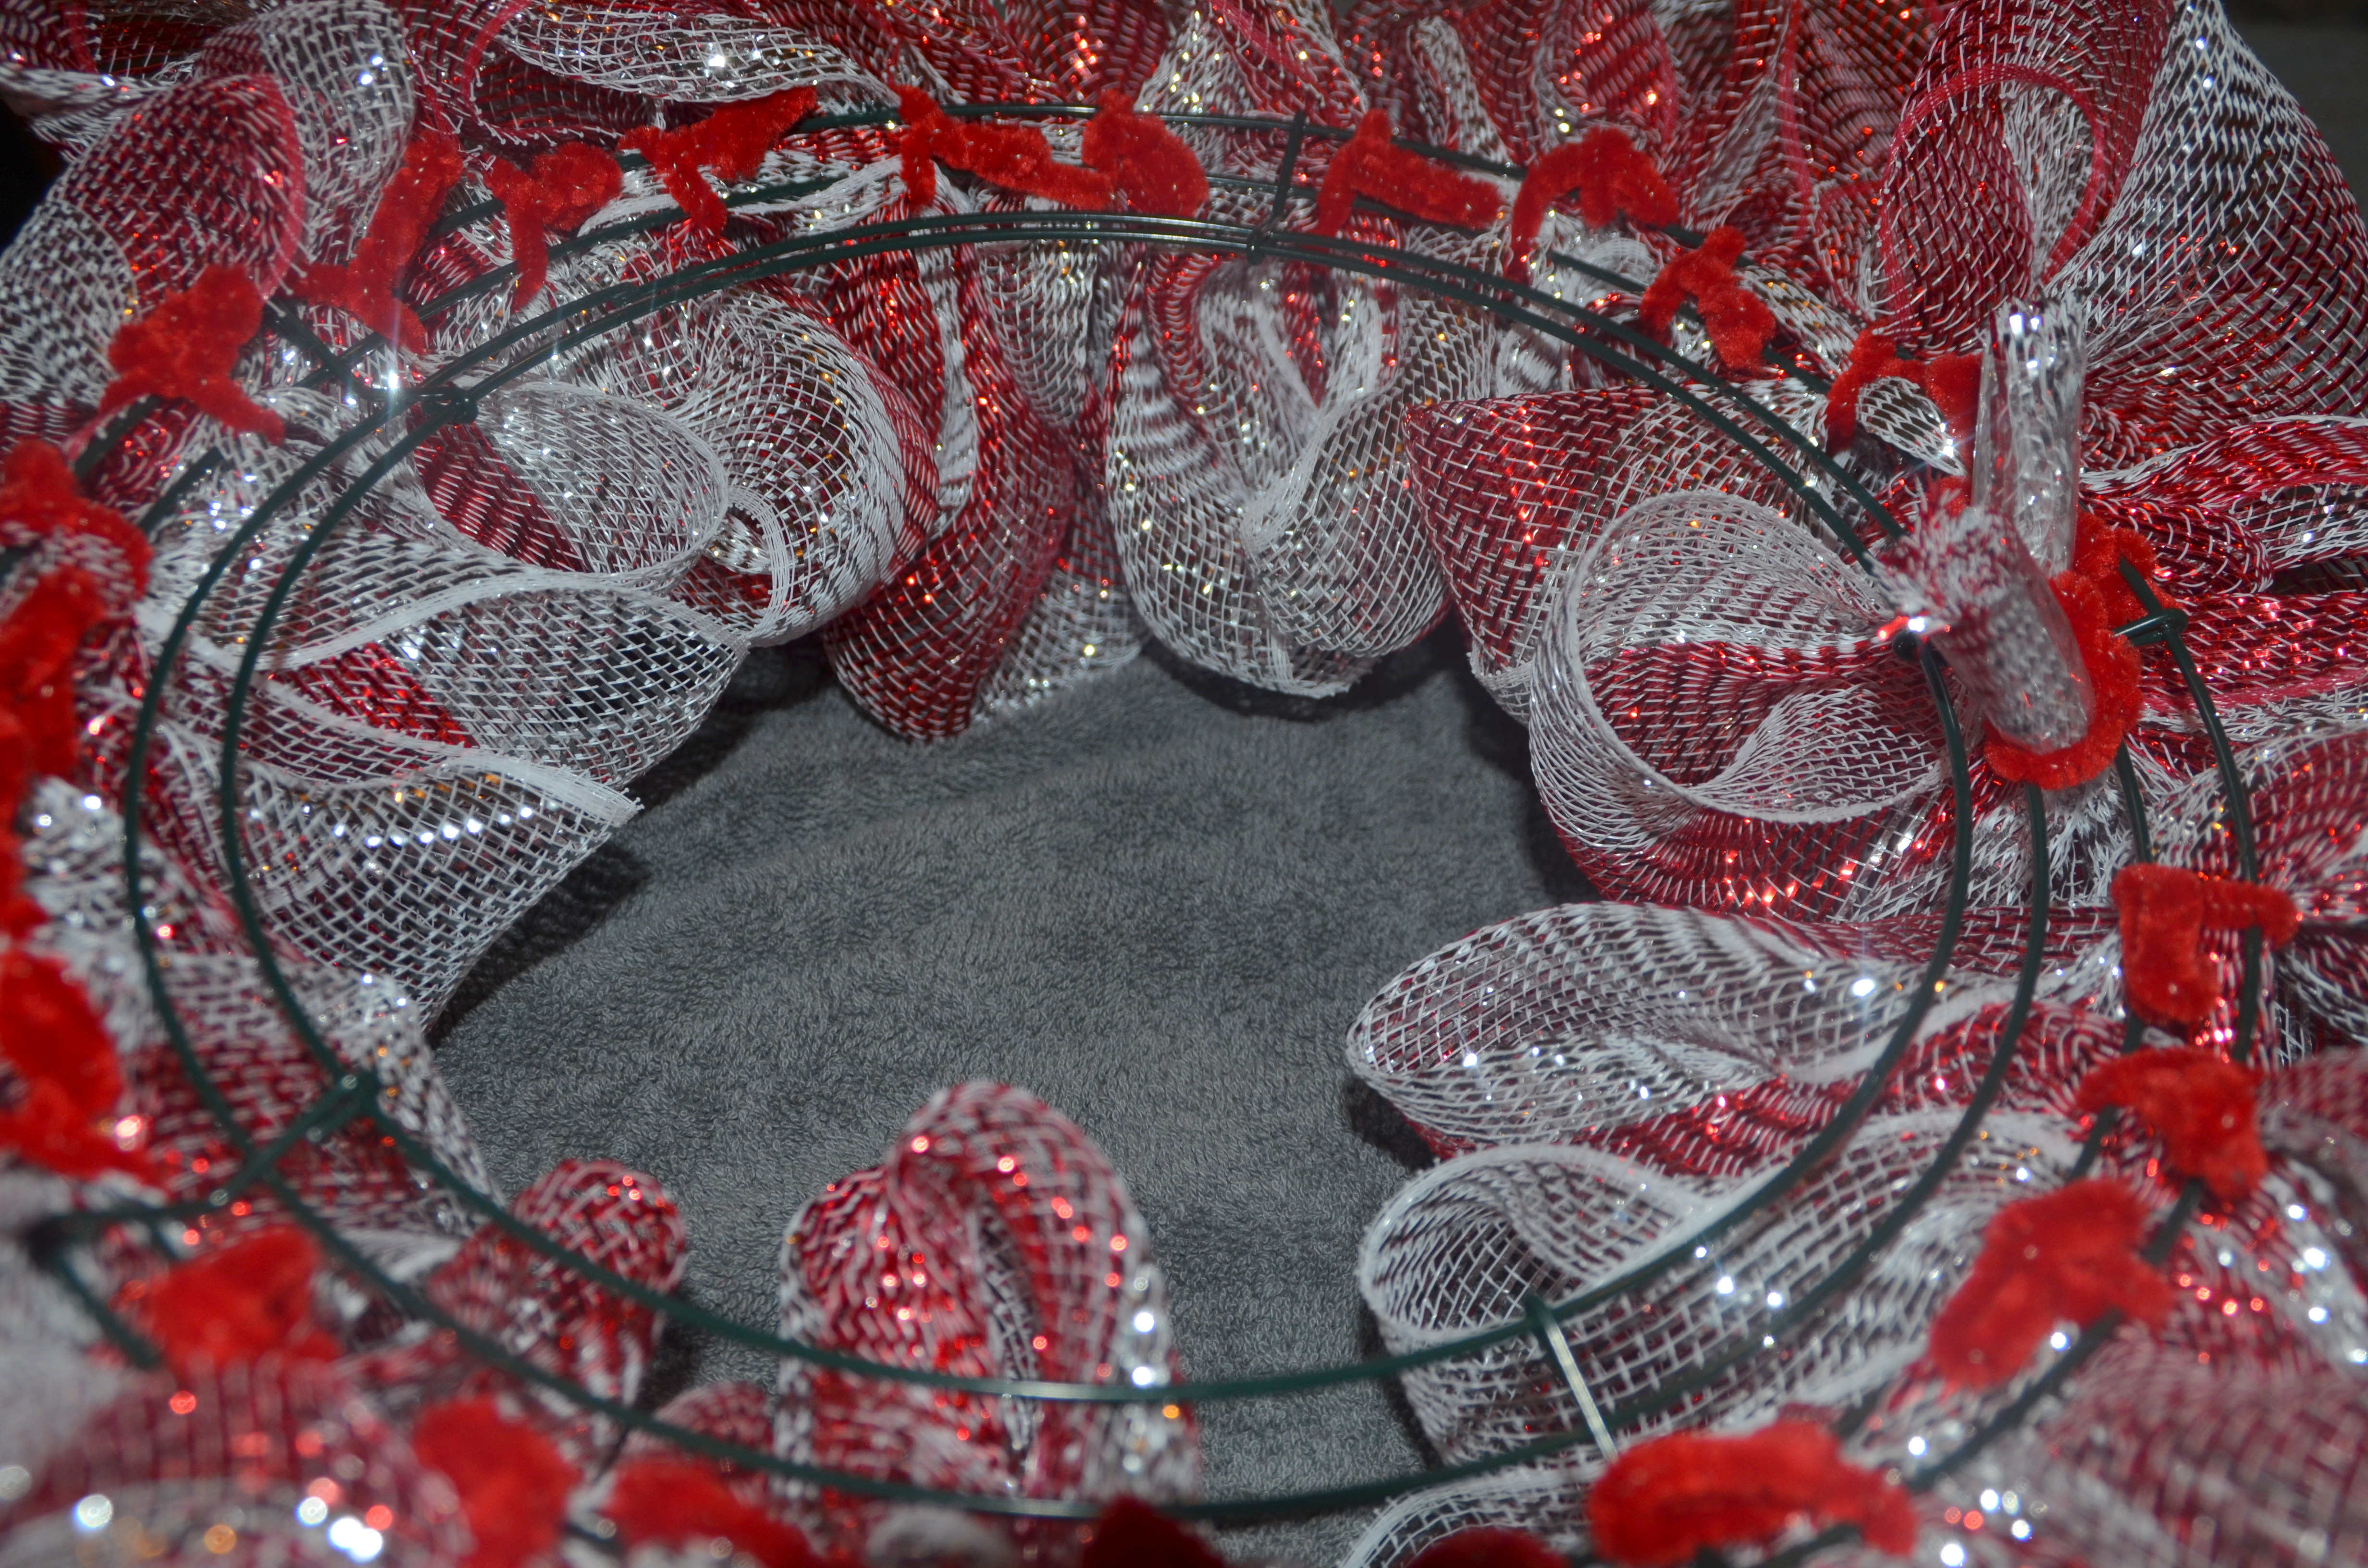 Deco mesh christmas wreath tutorial donnahup deco mesh christmas wreath tutorial baditri Images